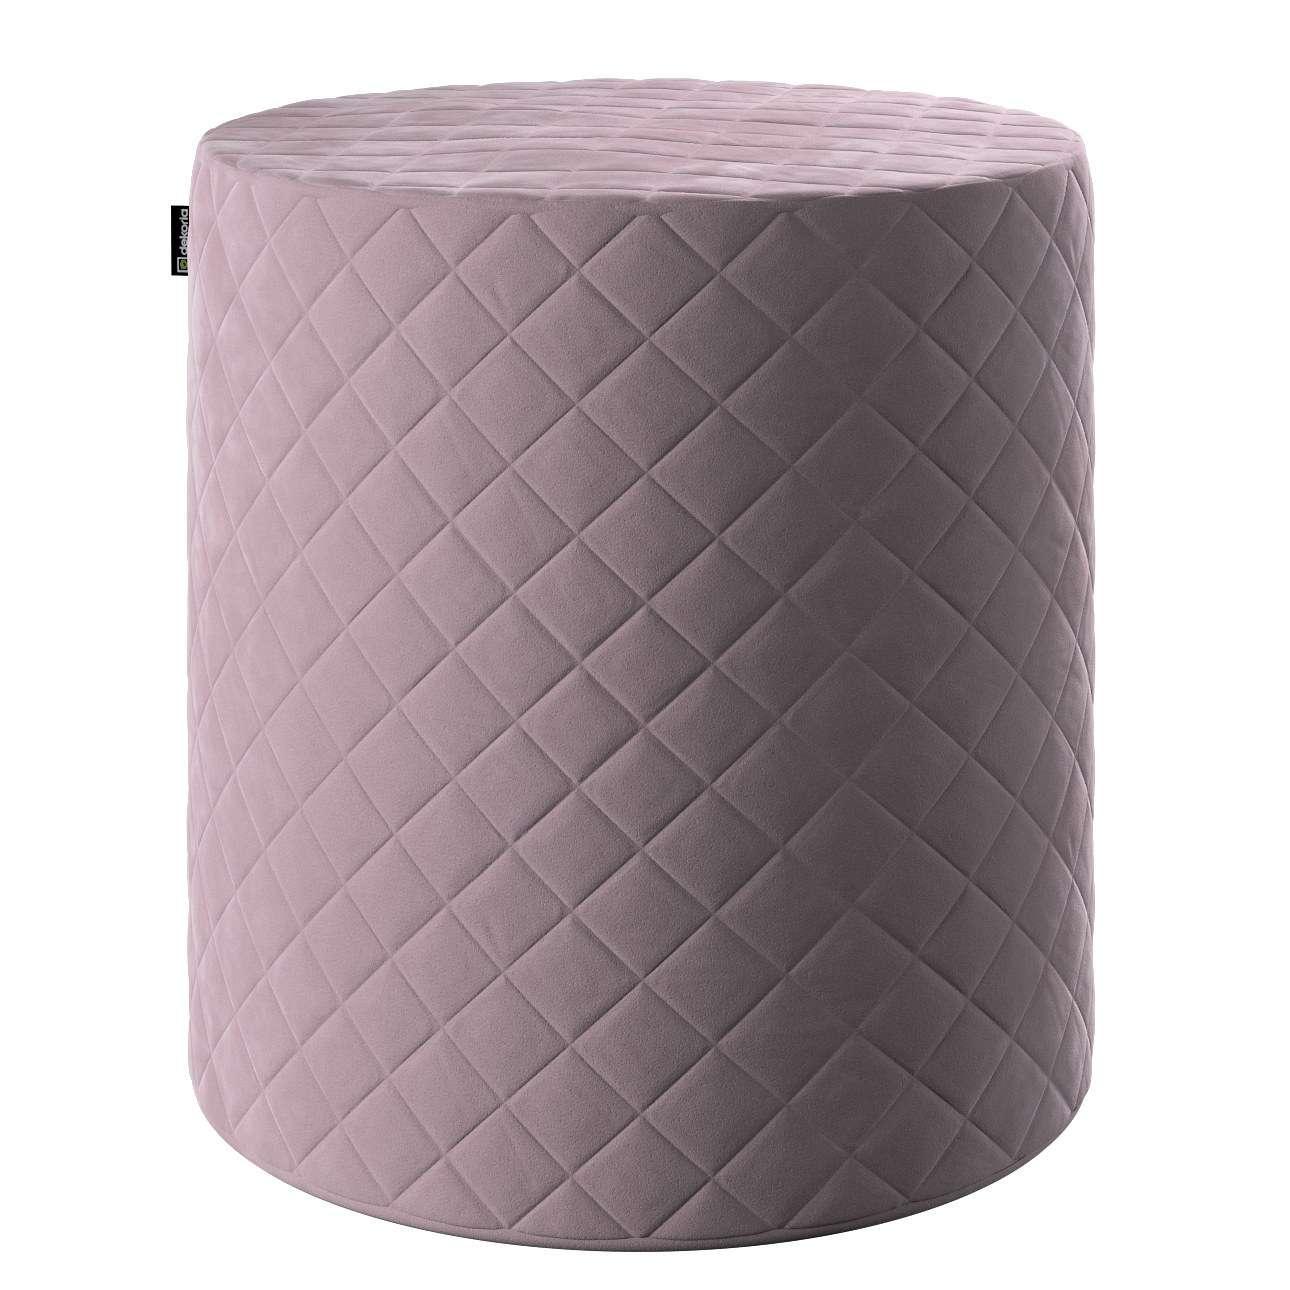 Pouf Barrel gesteppt, rosa, ø 40 x 40 cm, Velvet   Wohnzimmer > Hocker & Poufs > Poufs   Stoff   Dekoria